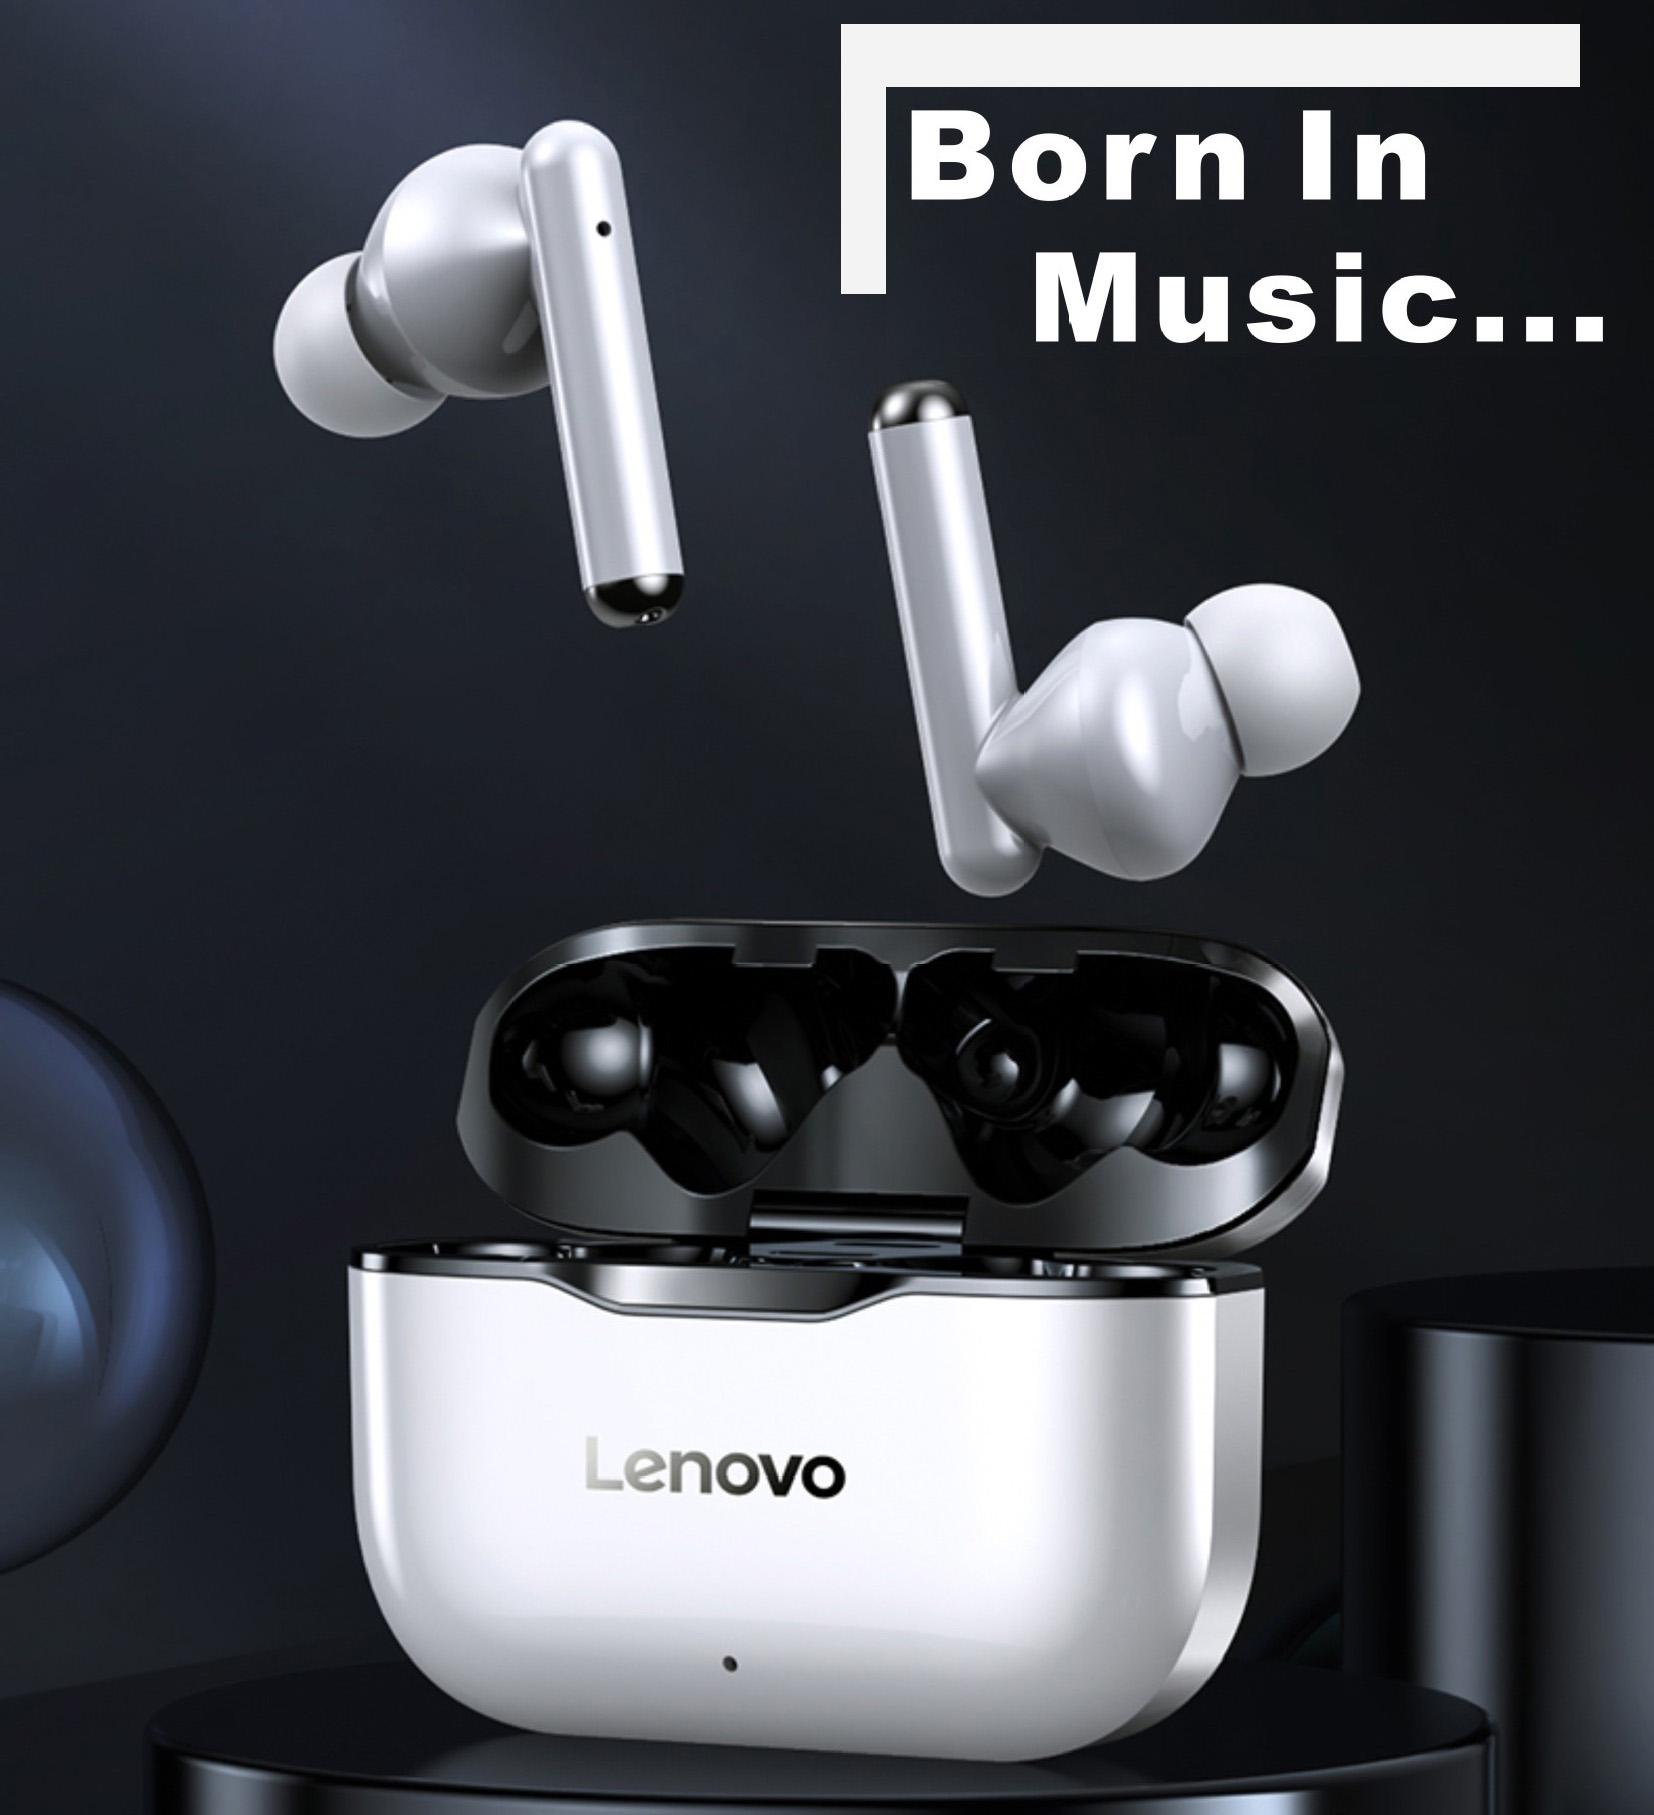 Lenovo LP1 TWS drahtlose Bluetooth 5.0 Kopfhörer Earbuds Noise Cancellation mit Mikrofon Touch Control Auto Connect Headset DHL frei